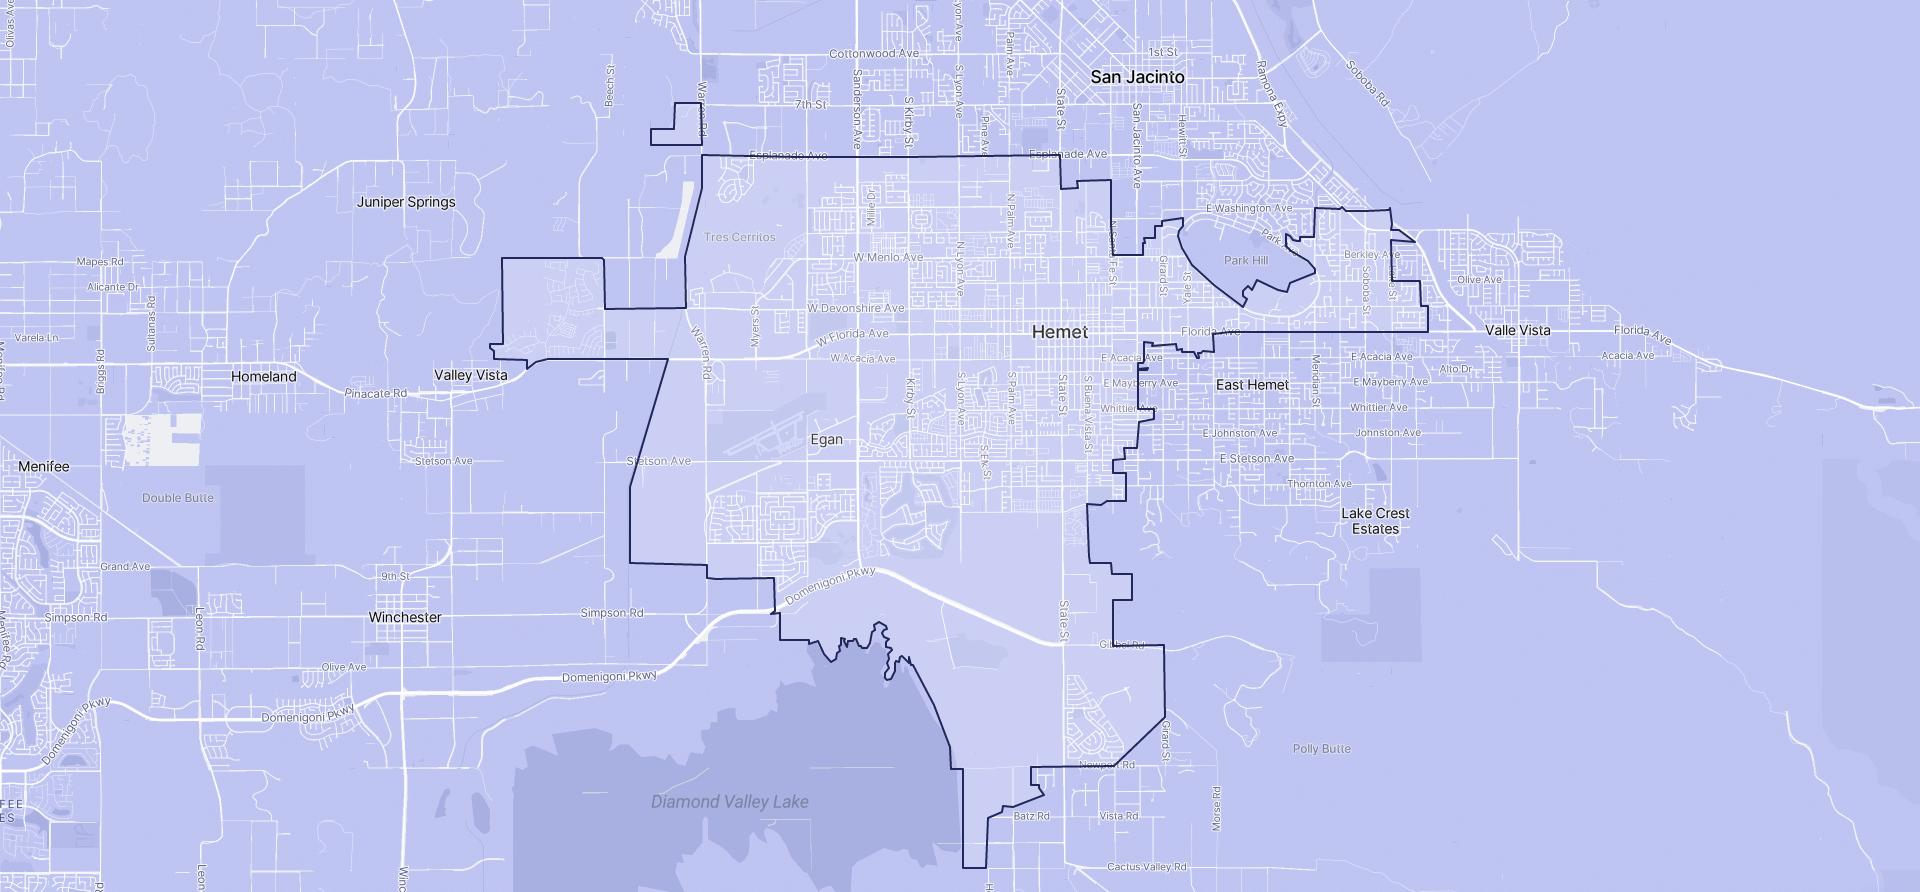 Image of Hemet boundaries on a map.